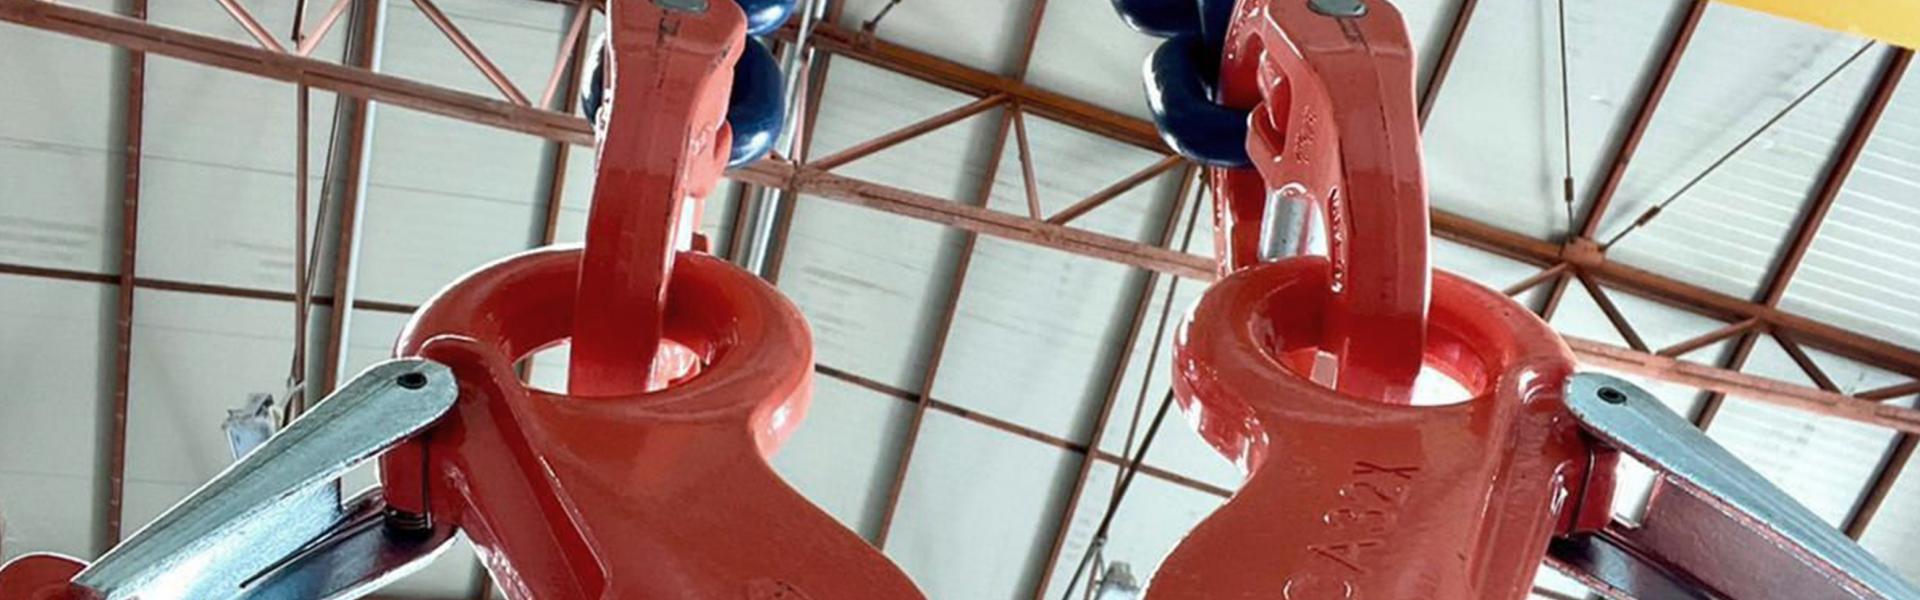 Chain slings: two legs, diameter 32 mm, grade 100, capacity 56,000 kg